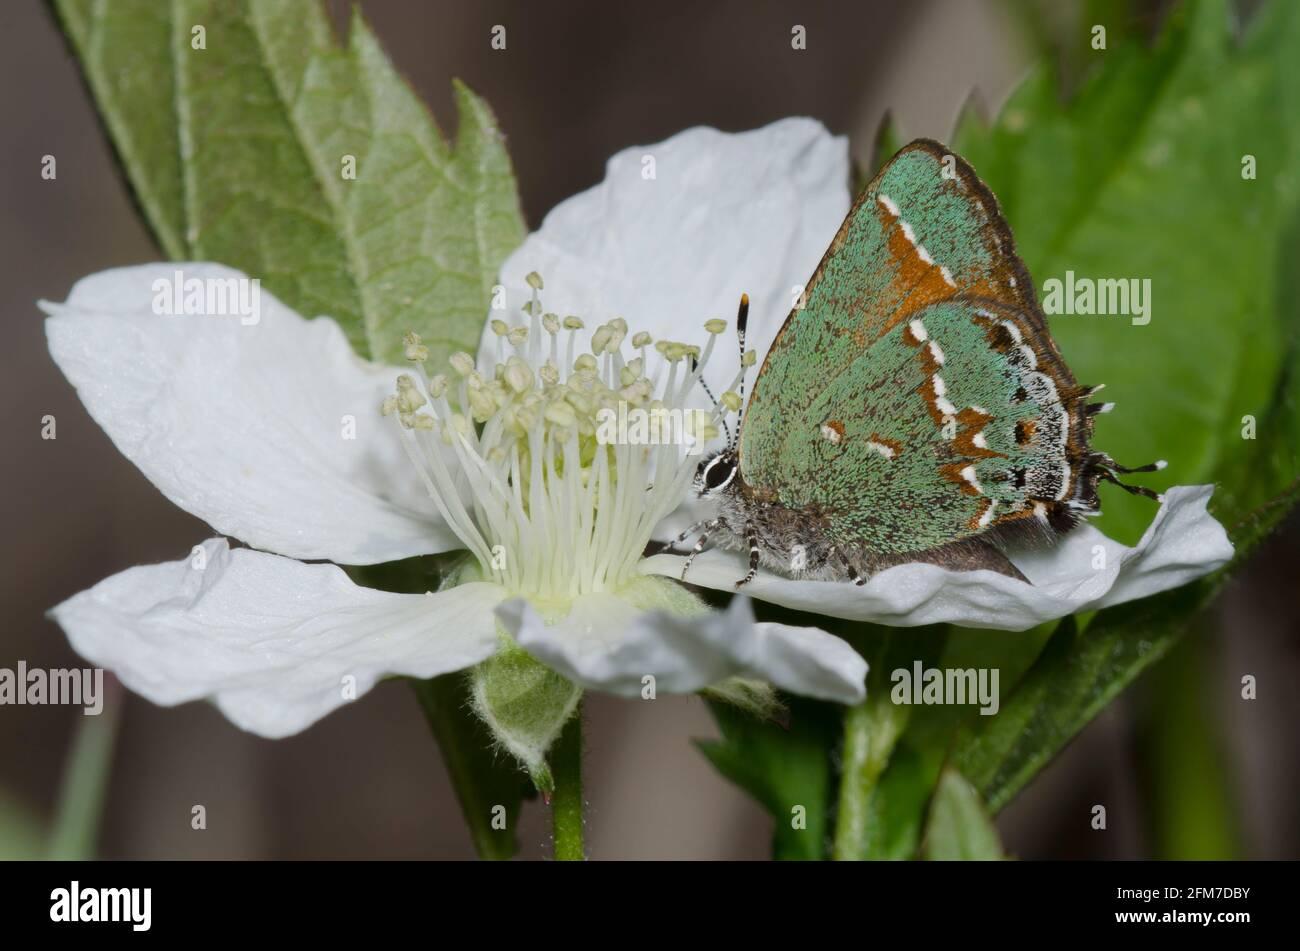 Juniper Hairstreak, Callophrys gryneus, nectaring de BlackBerry, Rubus sp. Banque D'Images